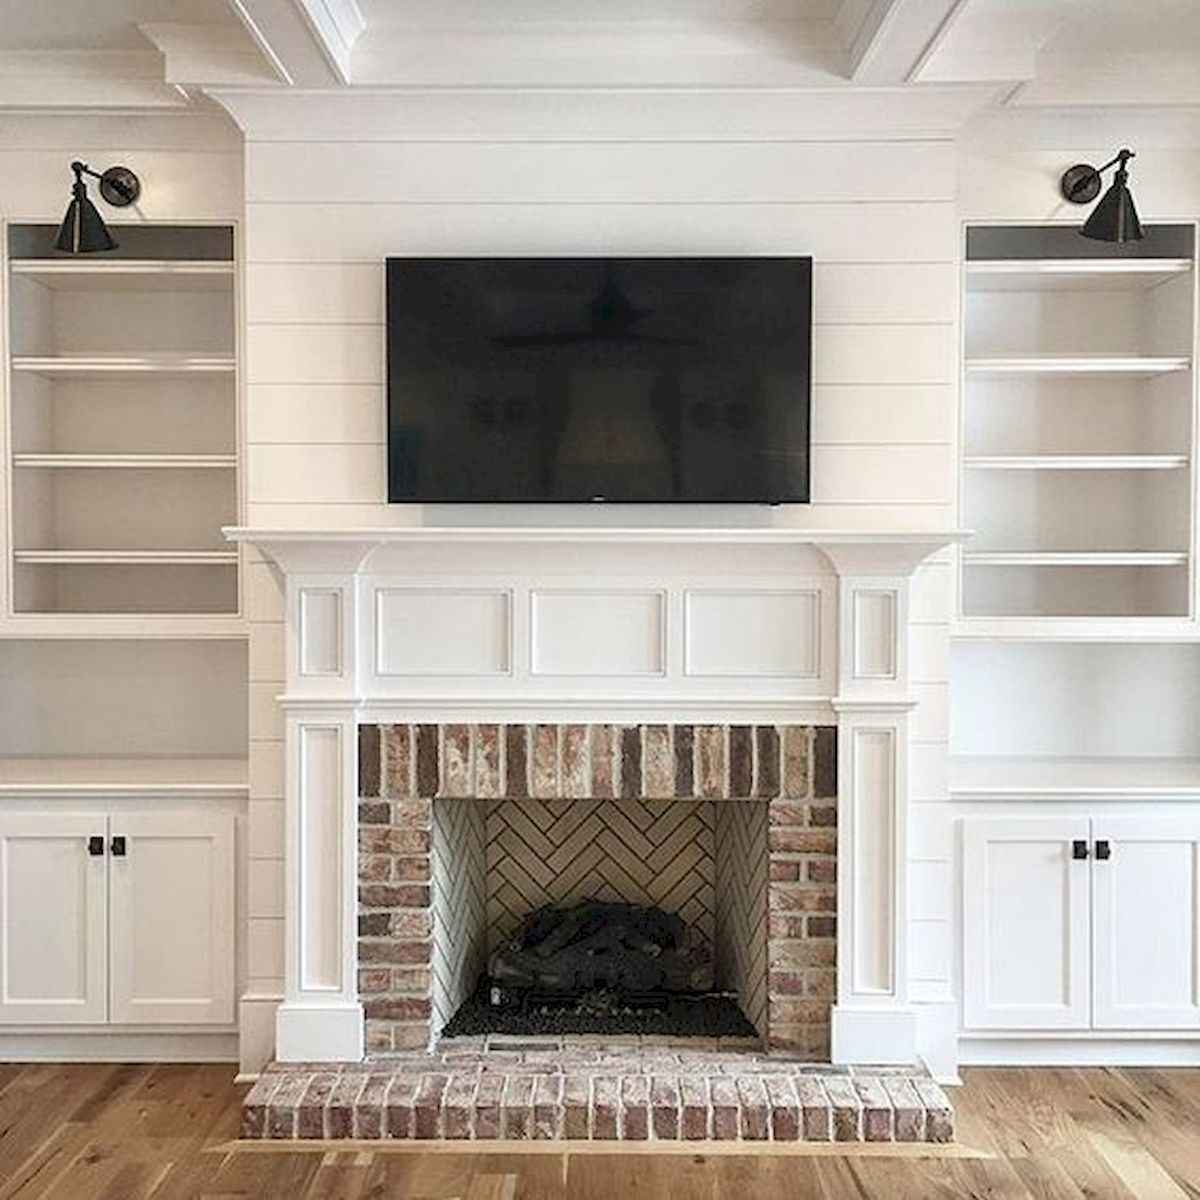 40 Awesome Fireplace Makeover For Farmhouse Home Decor (10)